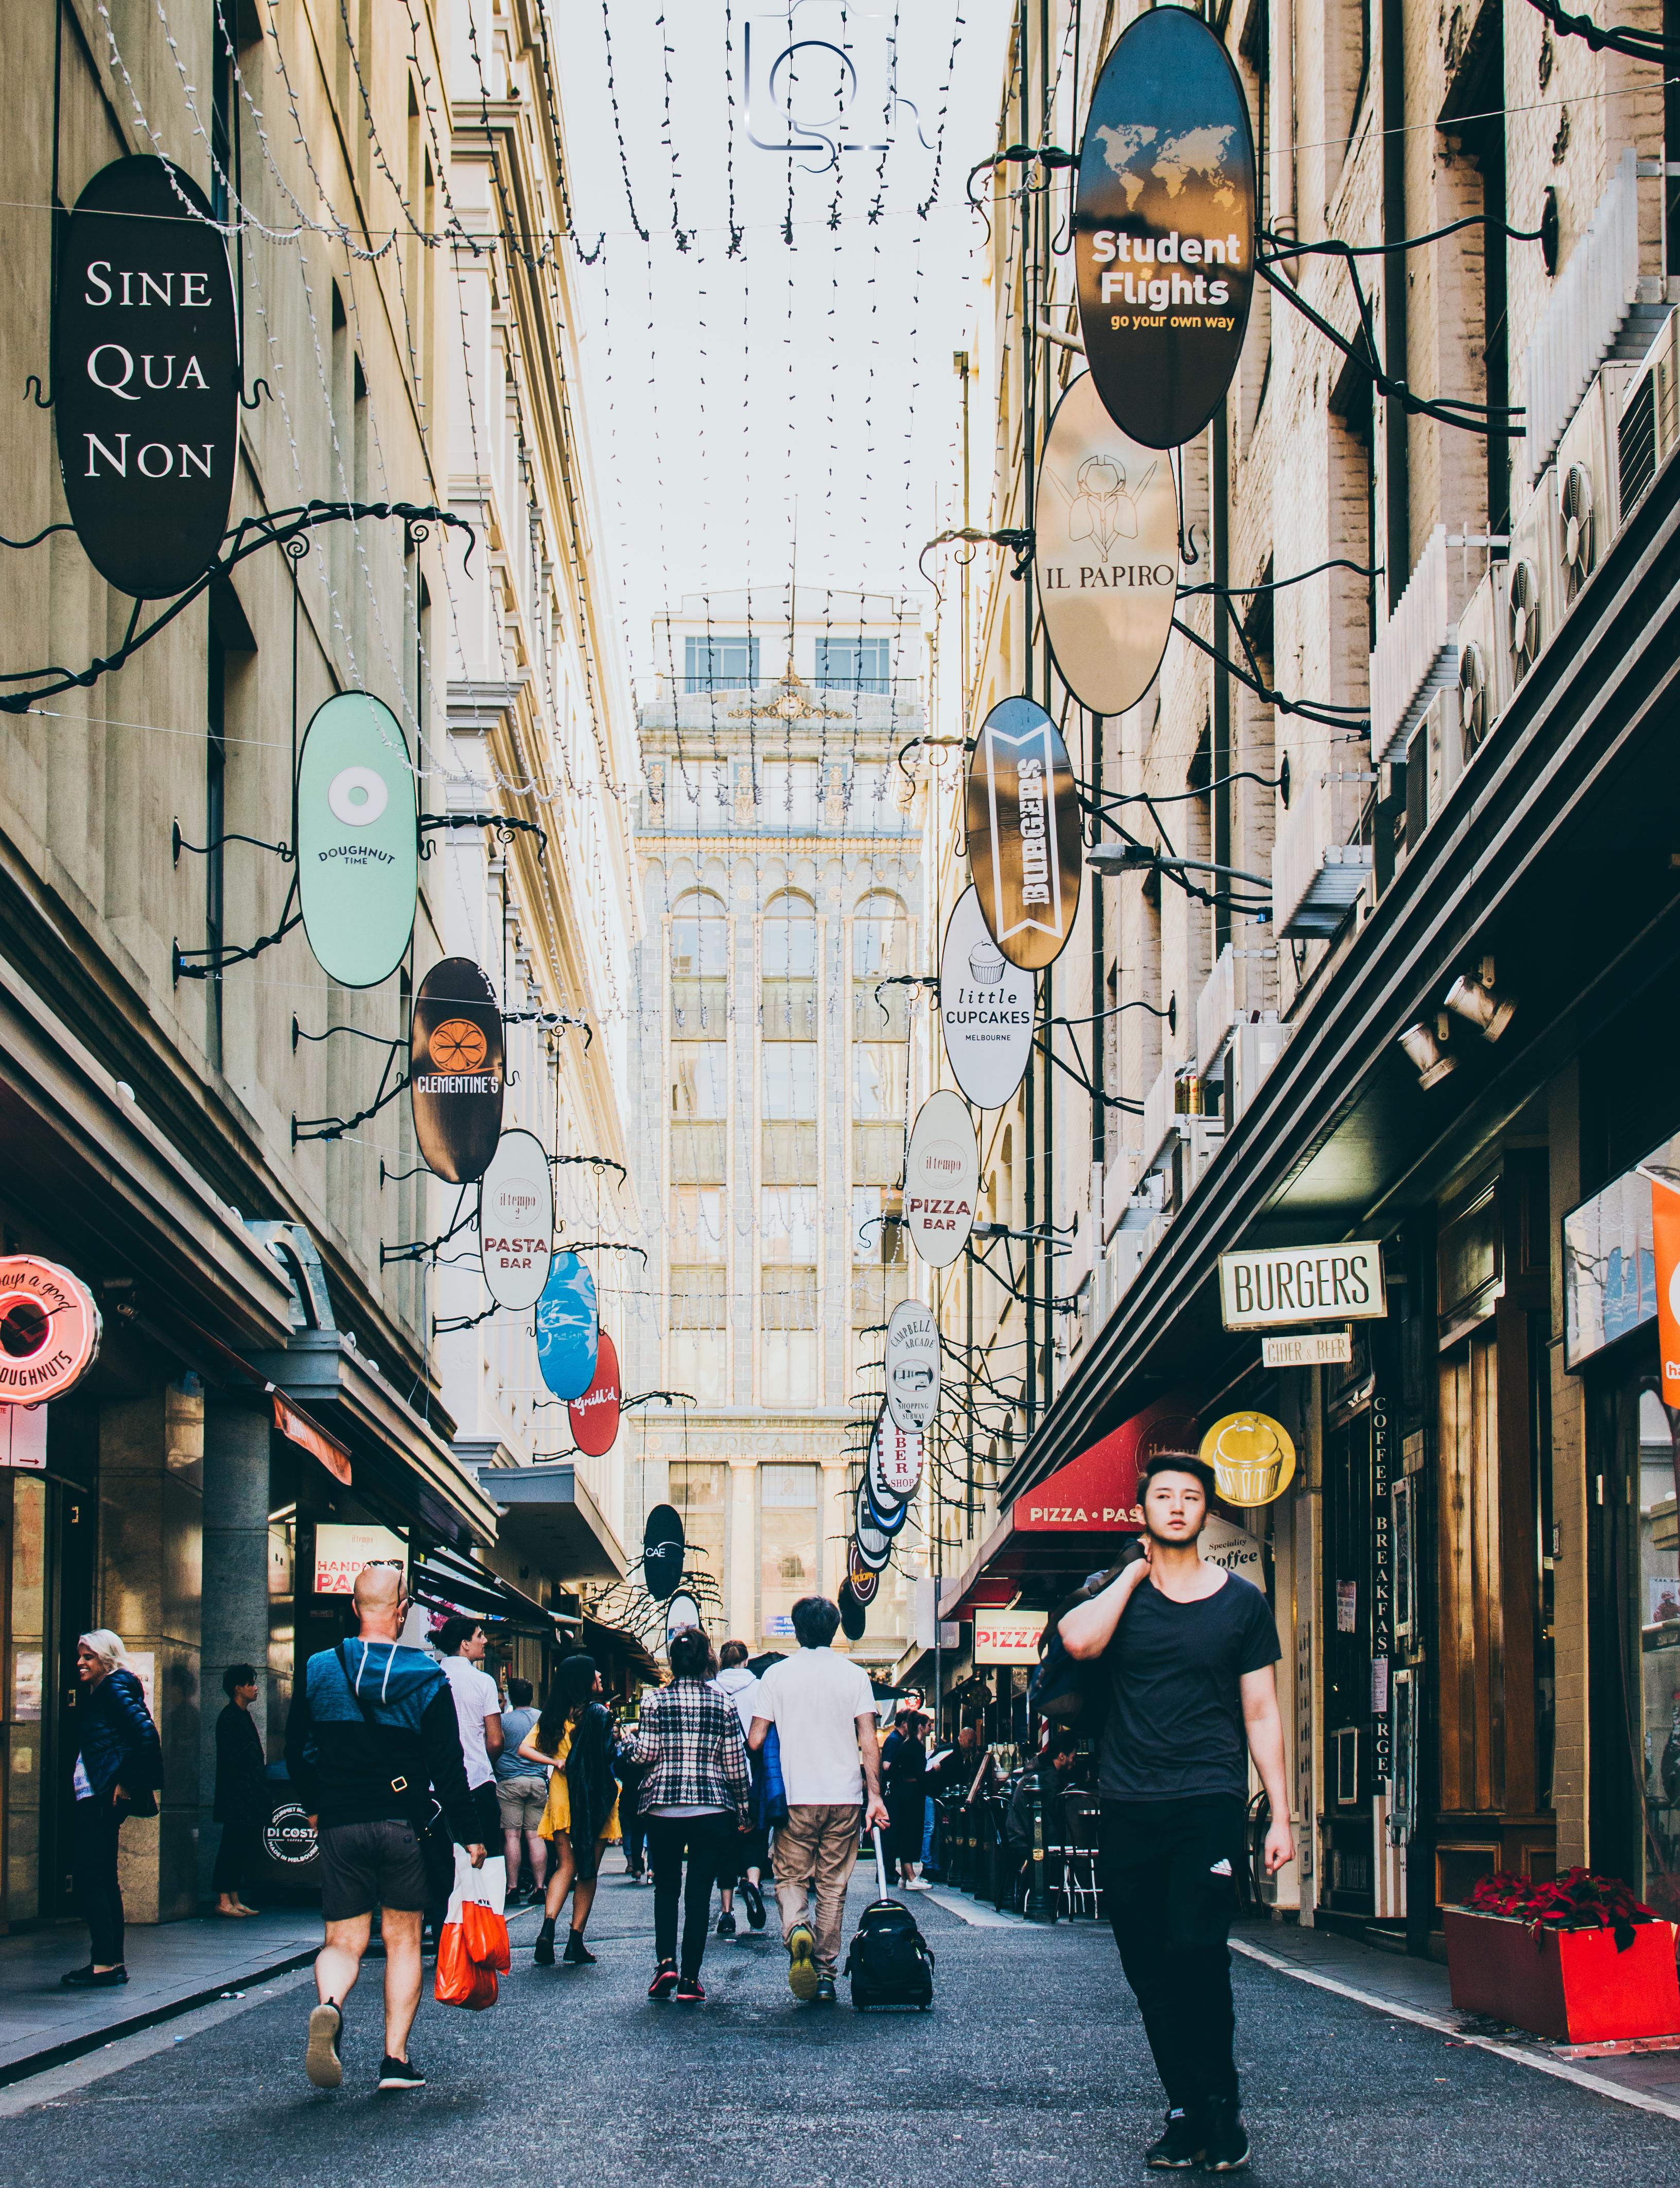 Melbourne City Laneway Street Photography